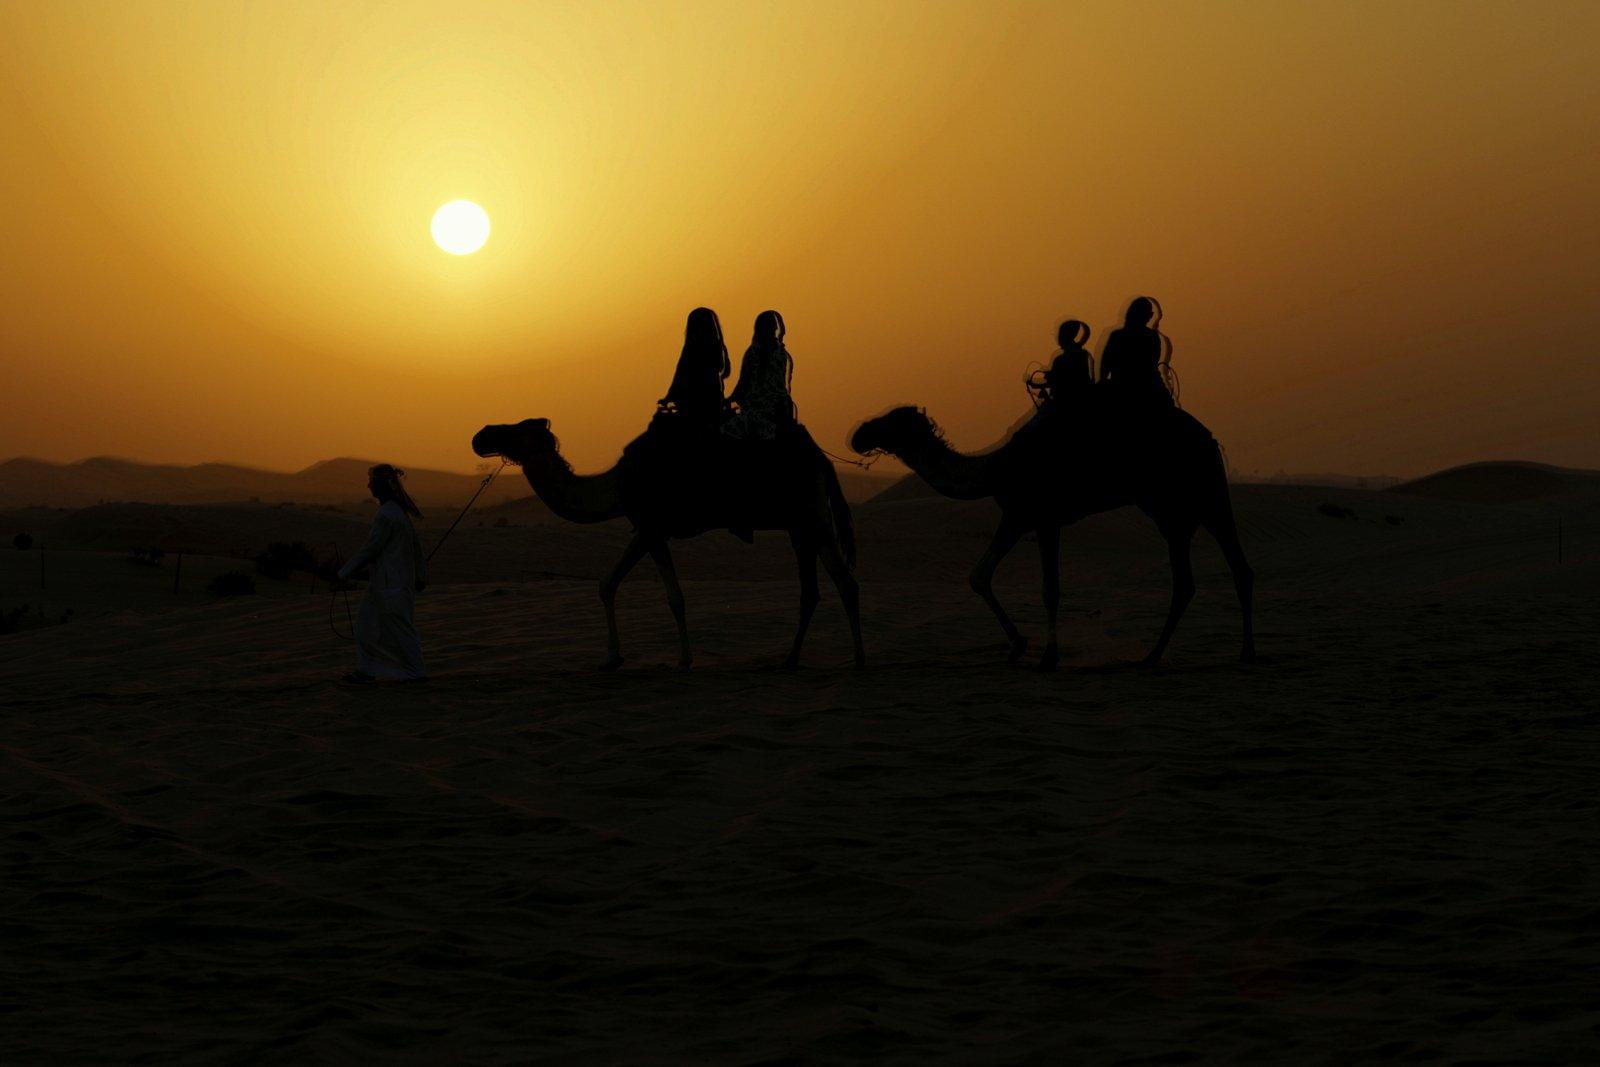 Kamelinratsastusta auringon laskiessa